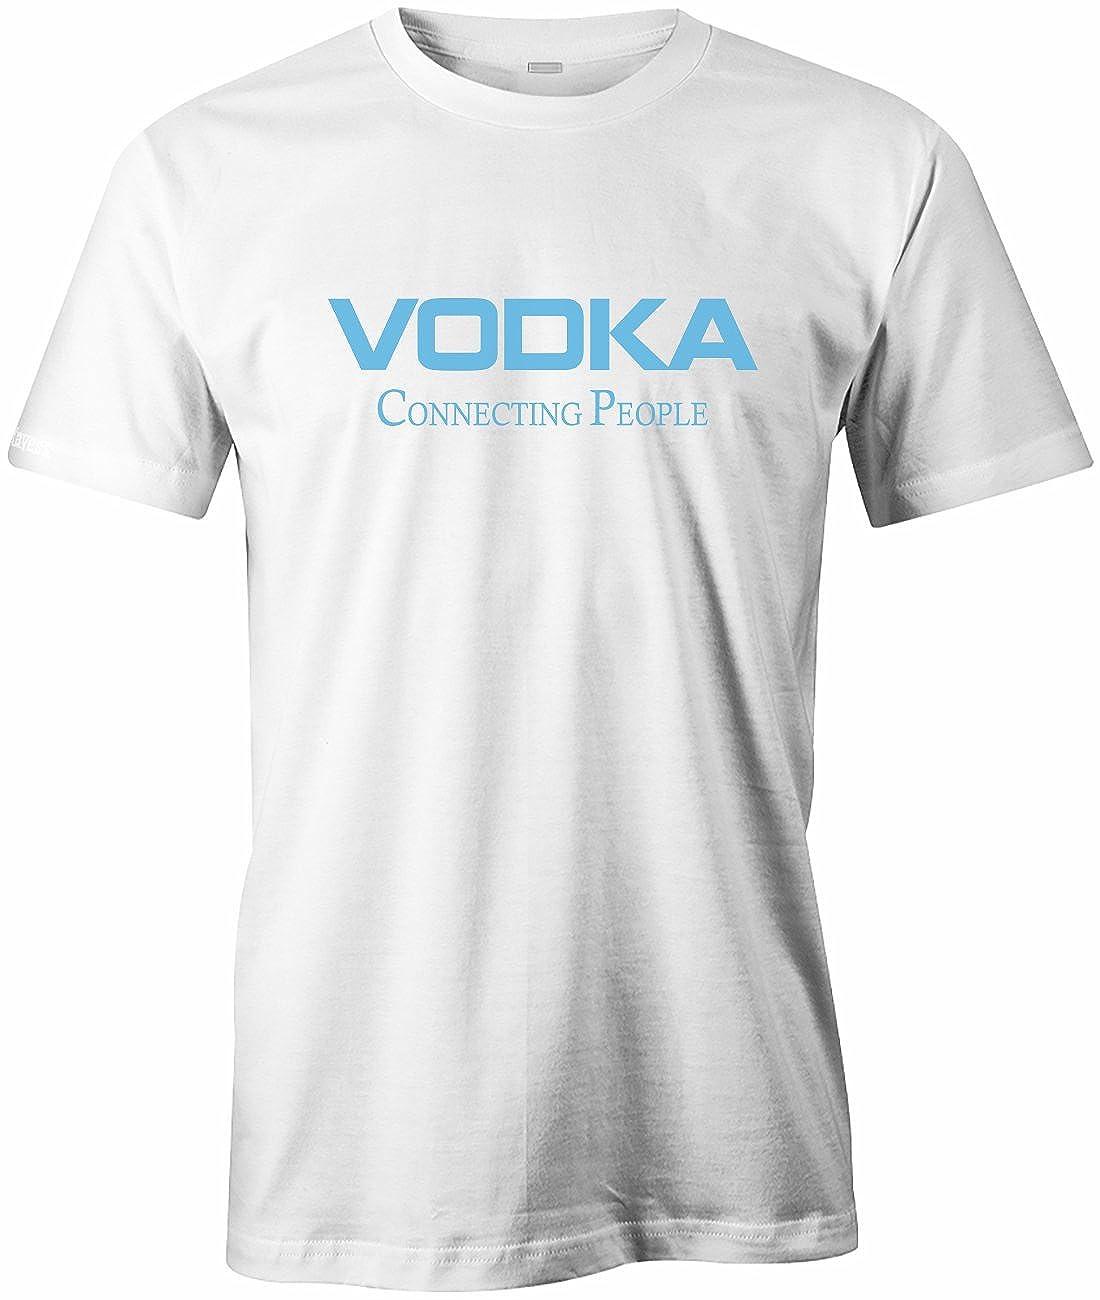 Gr VODKA Connecting People T-Shirt S bis XXXL